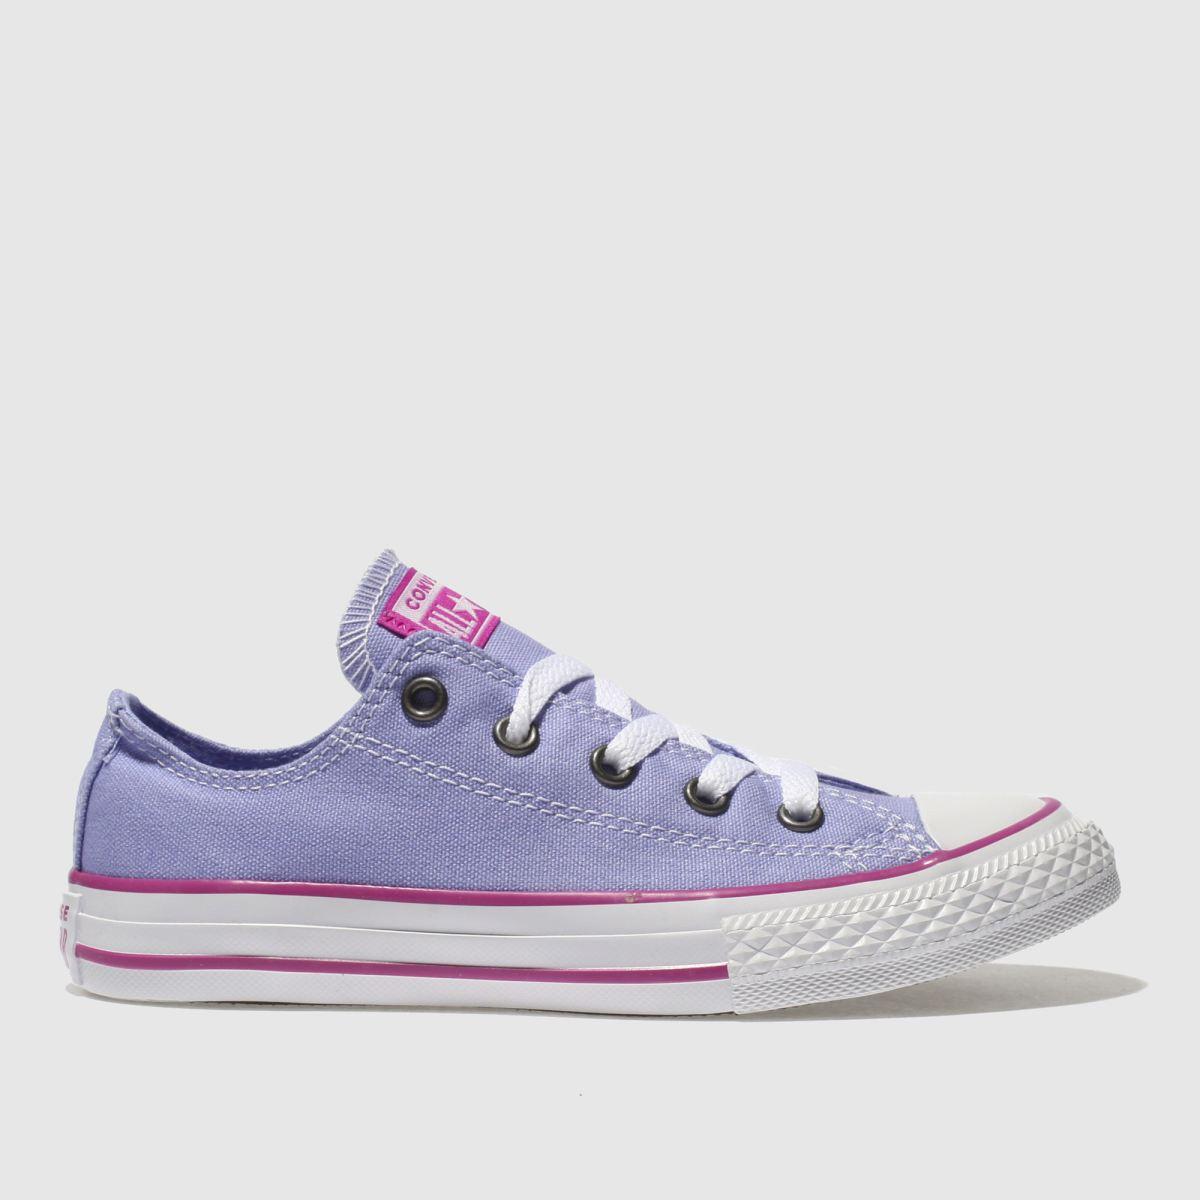 Converse Purple Chuck Taylor All Star Ox Girls Junior Trainers